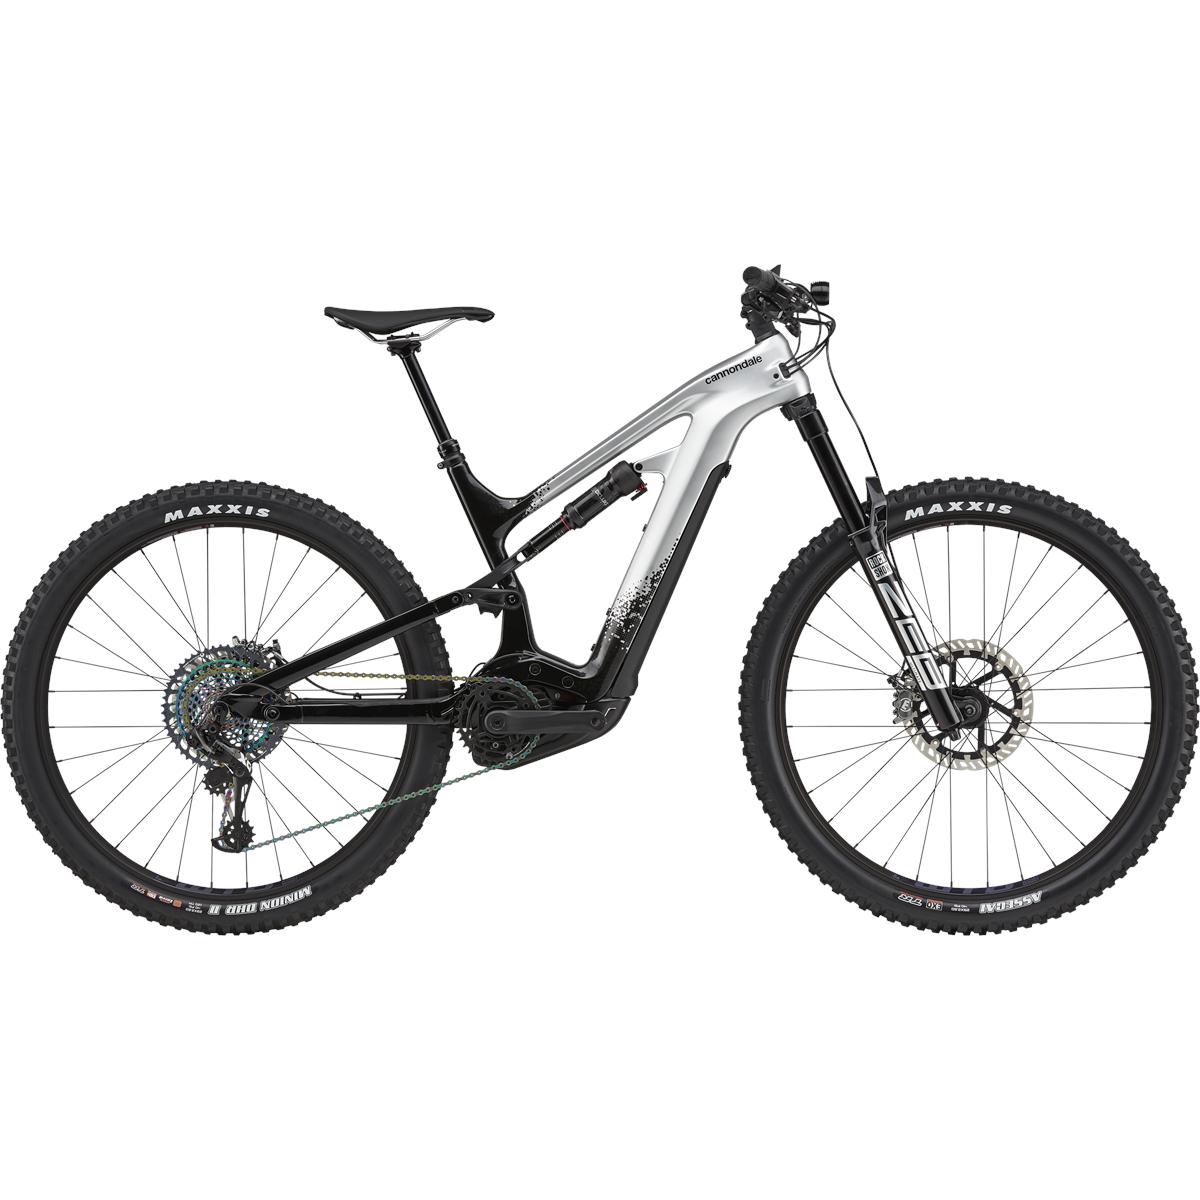 "Cannondale MOTERRA NEO Carbon 1 - 29"" MTB E-Bike - 2021 - Mercury"